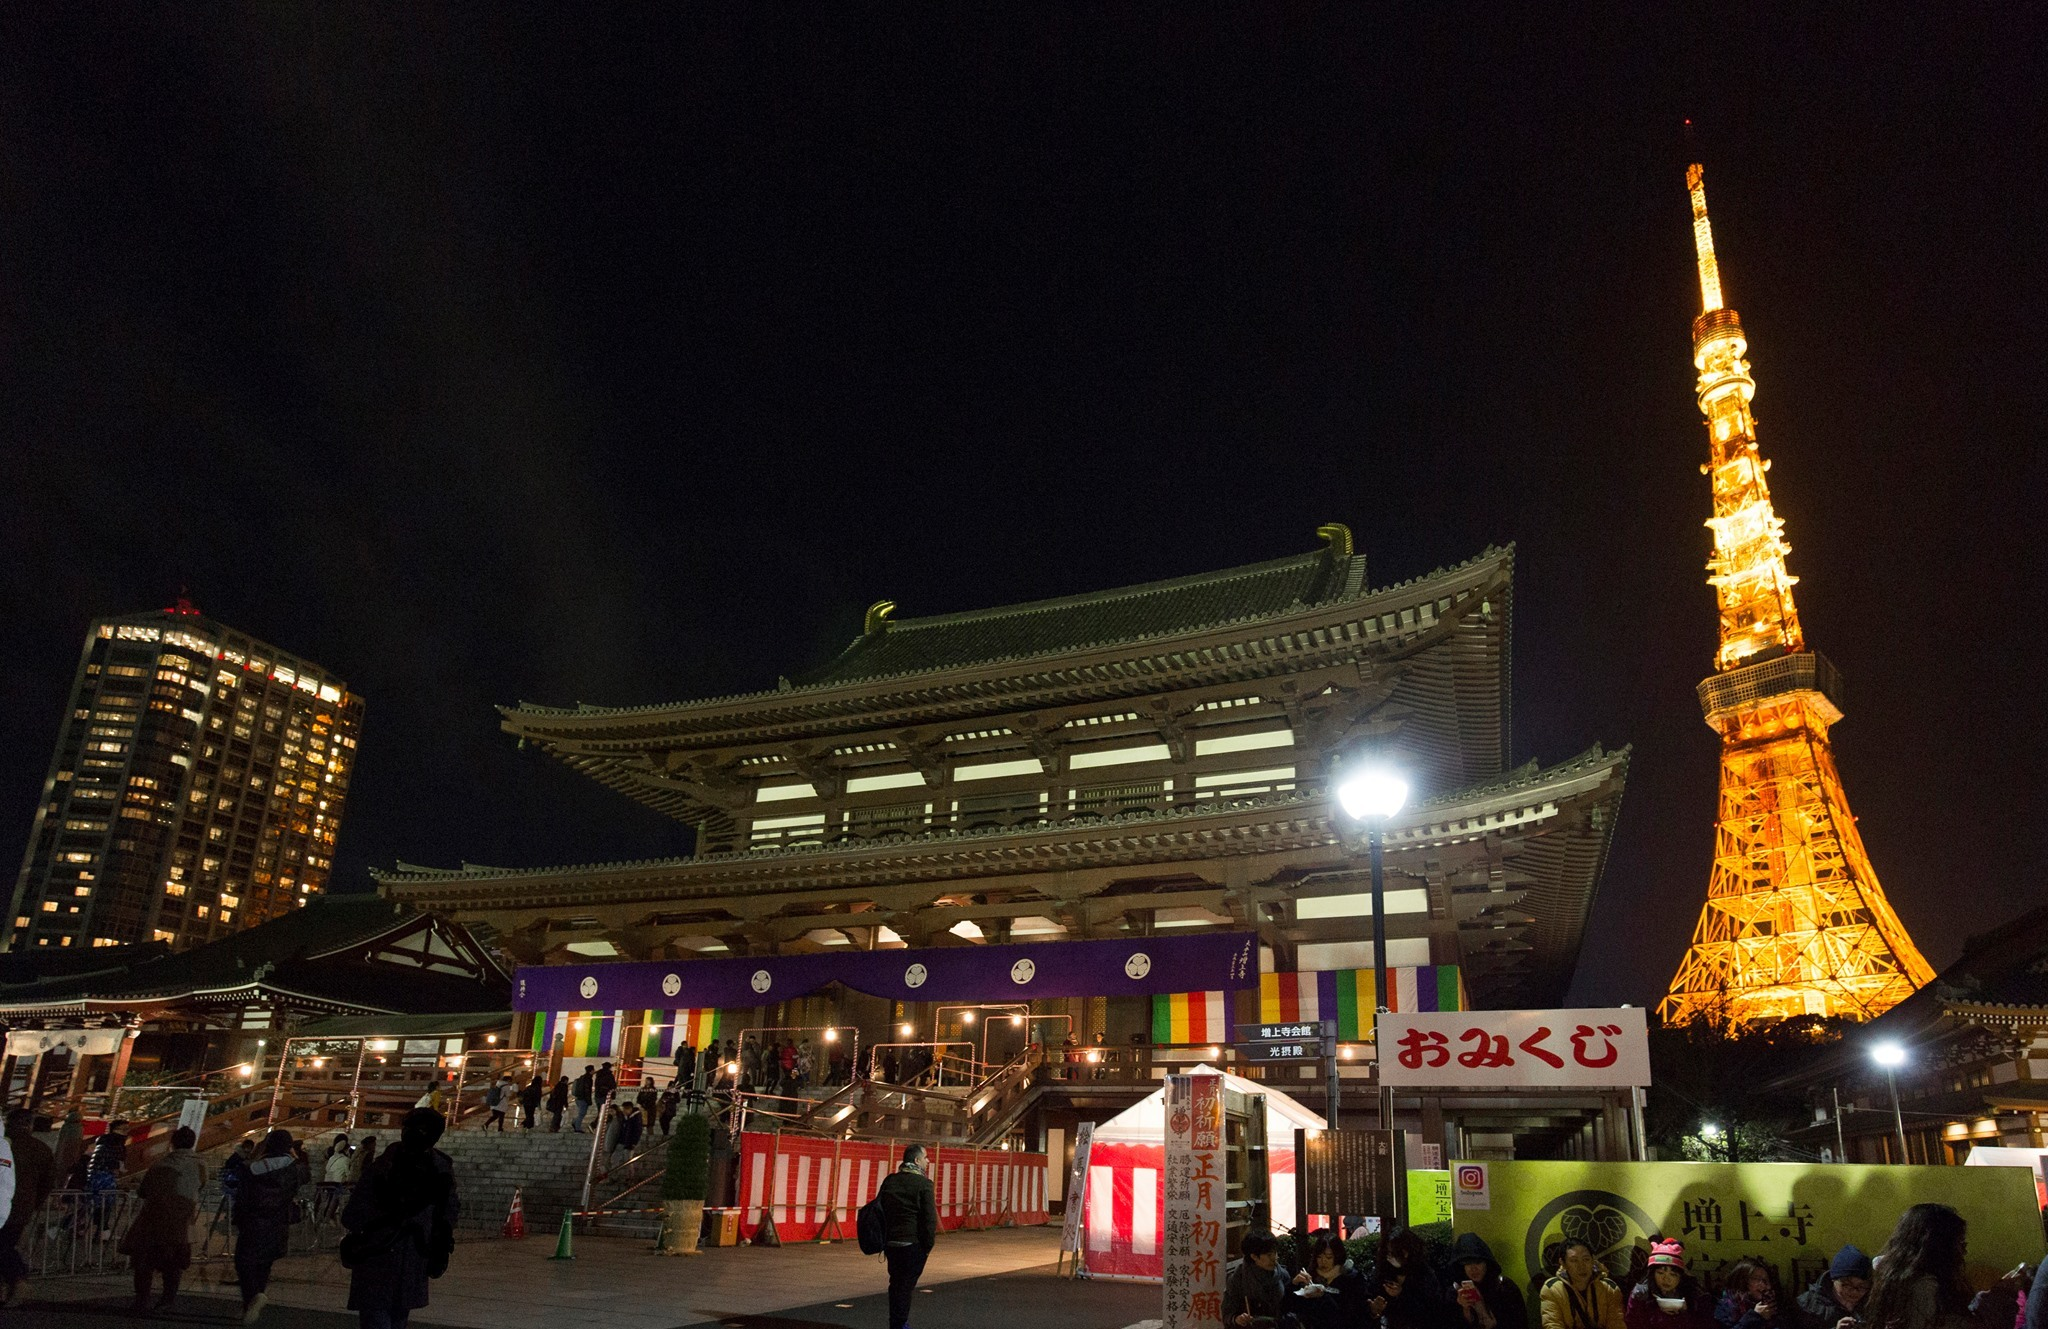 zojoji temple hatsumode new year's